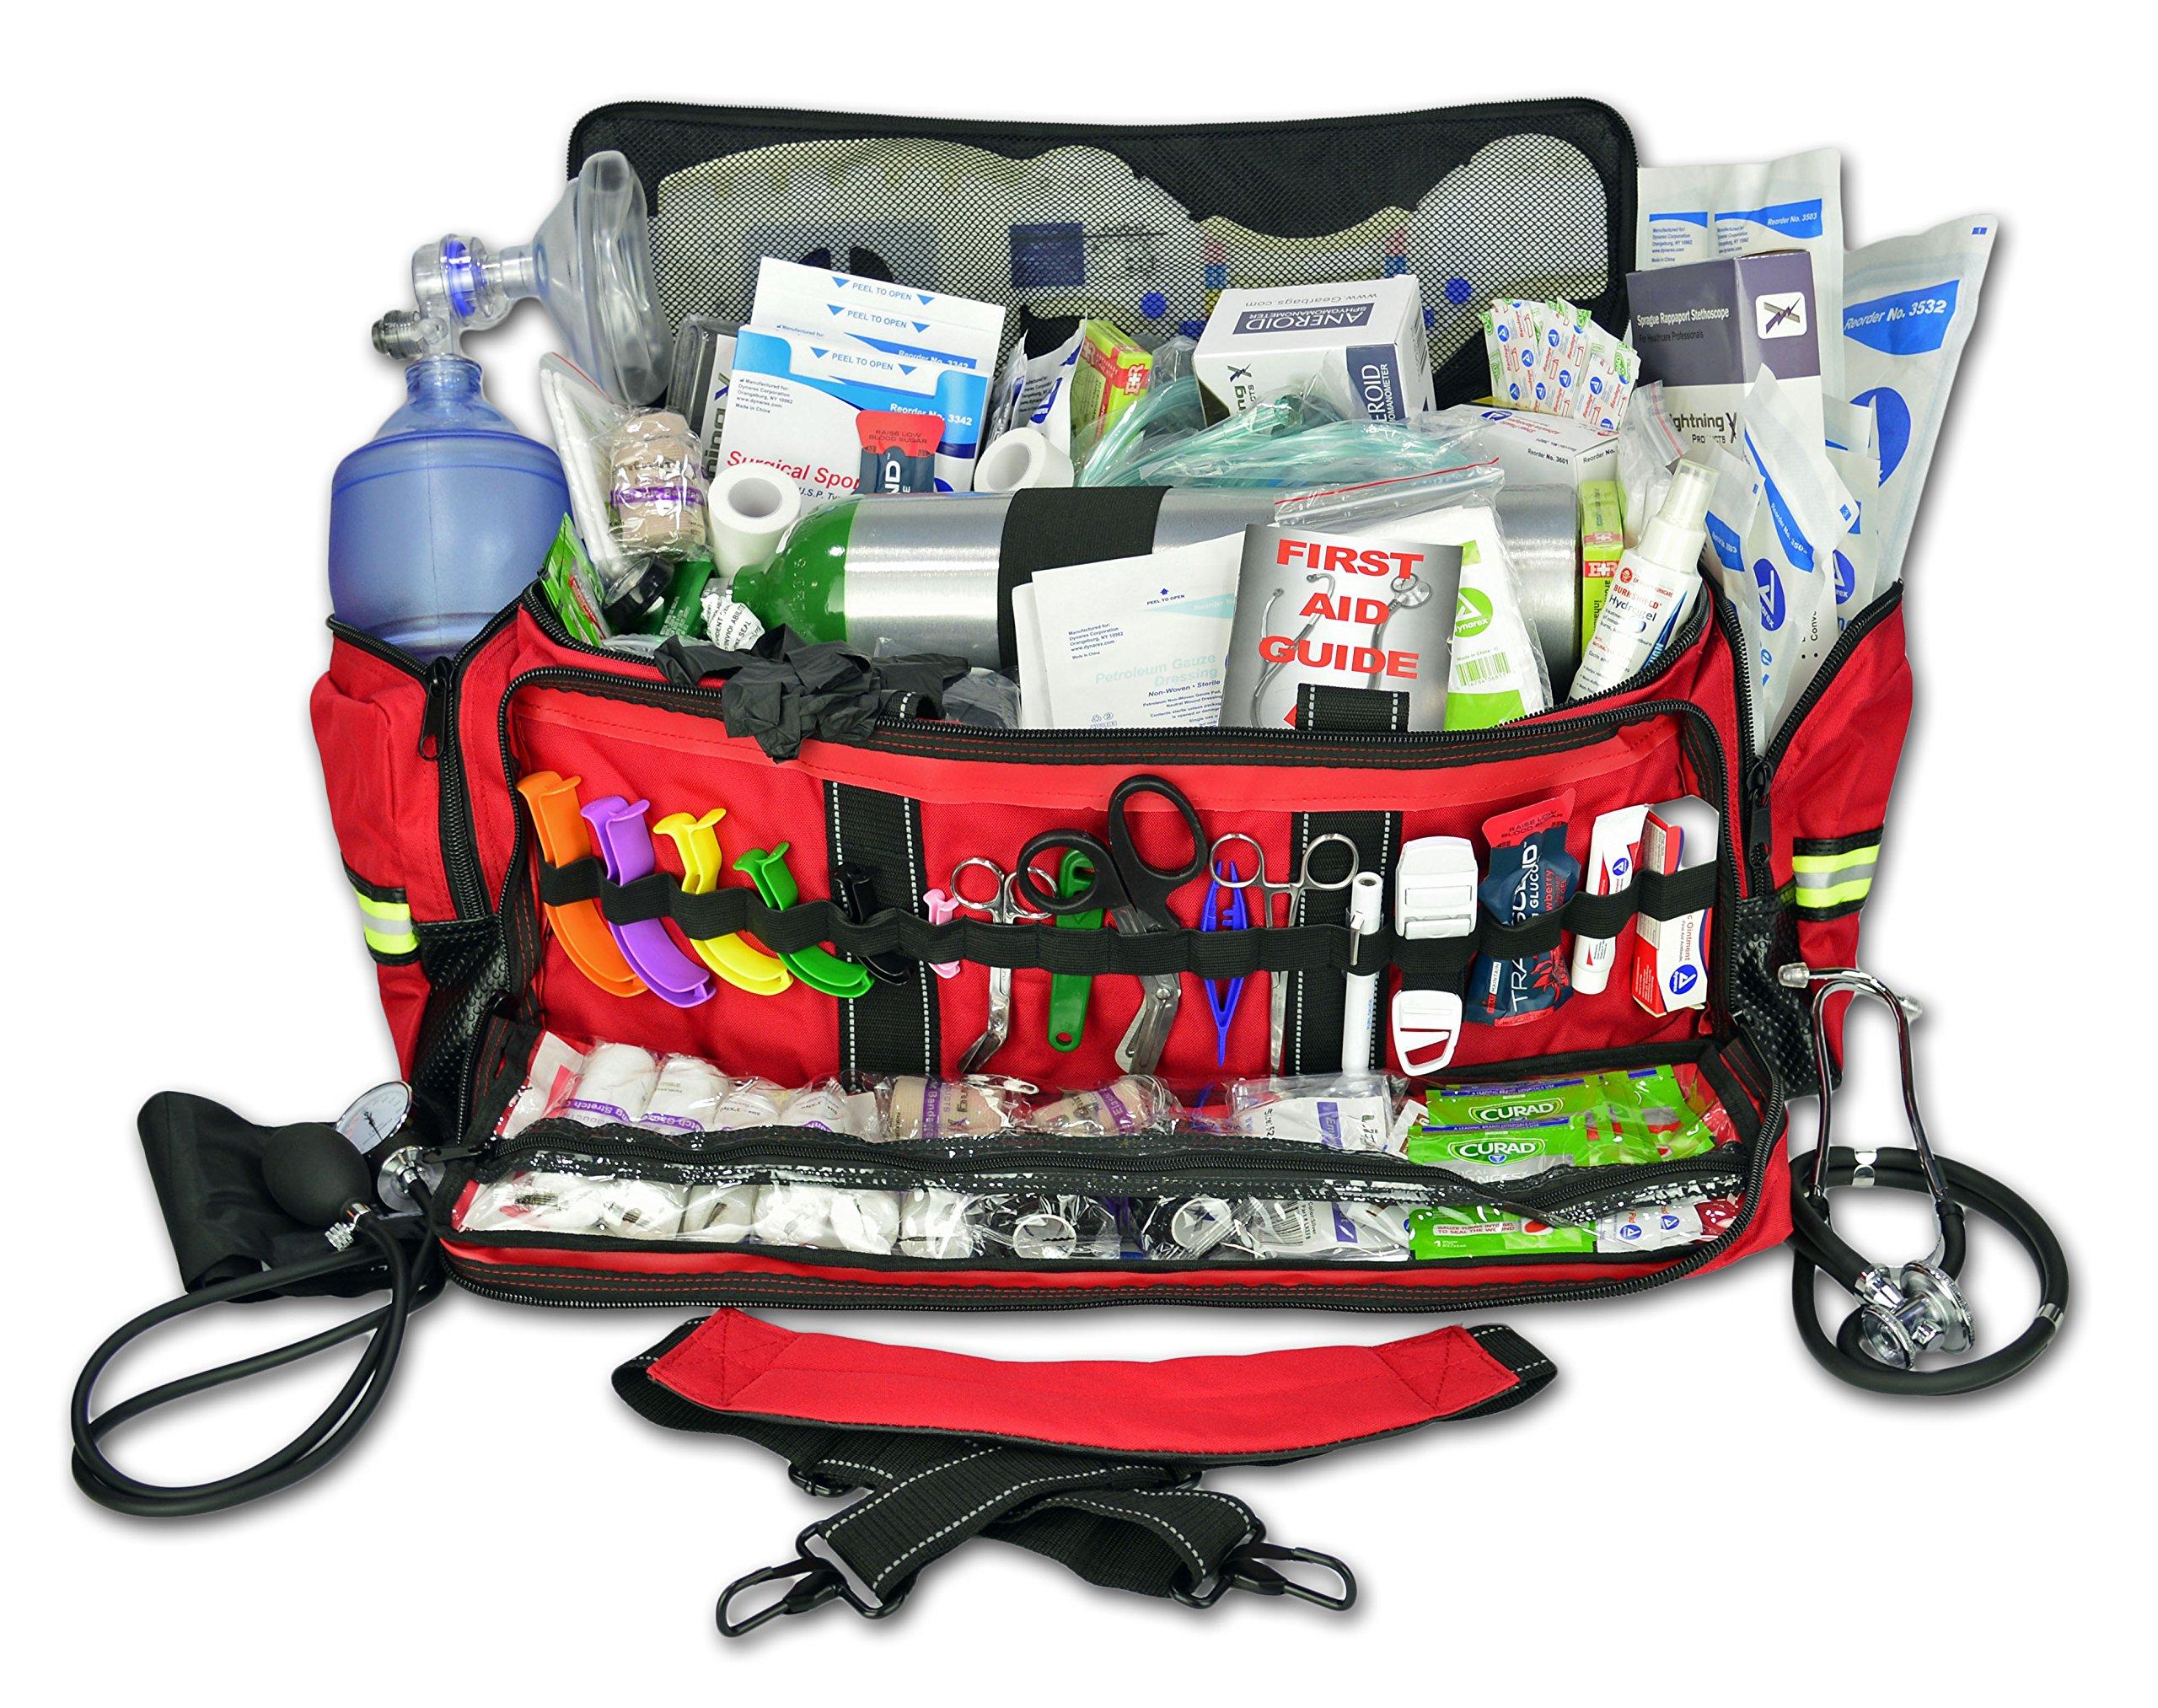 Lightning X Jumbo Oxygen Medic First Responder EMT/EMS Bag Stocked Trauma Kit LXMB50-SKD (Red) by Lightning X Products